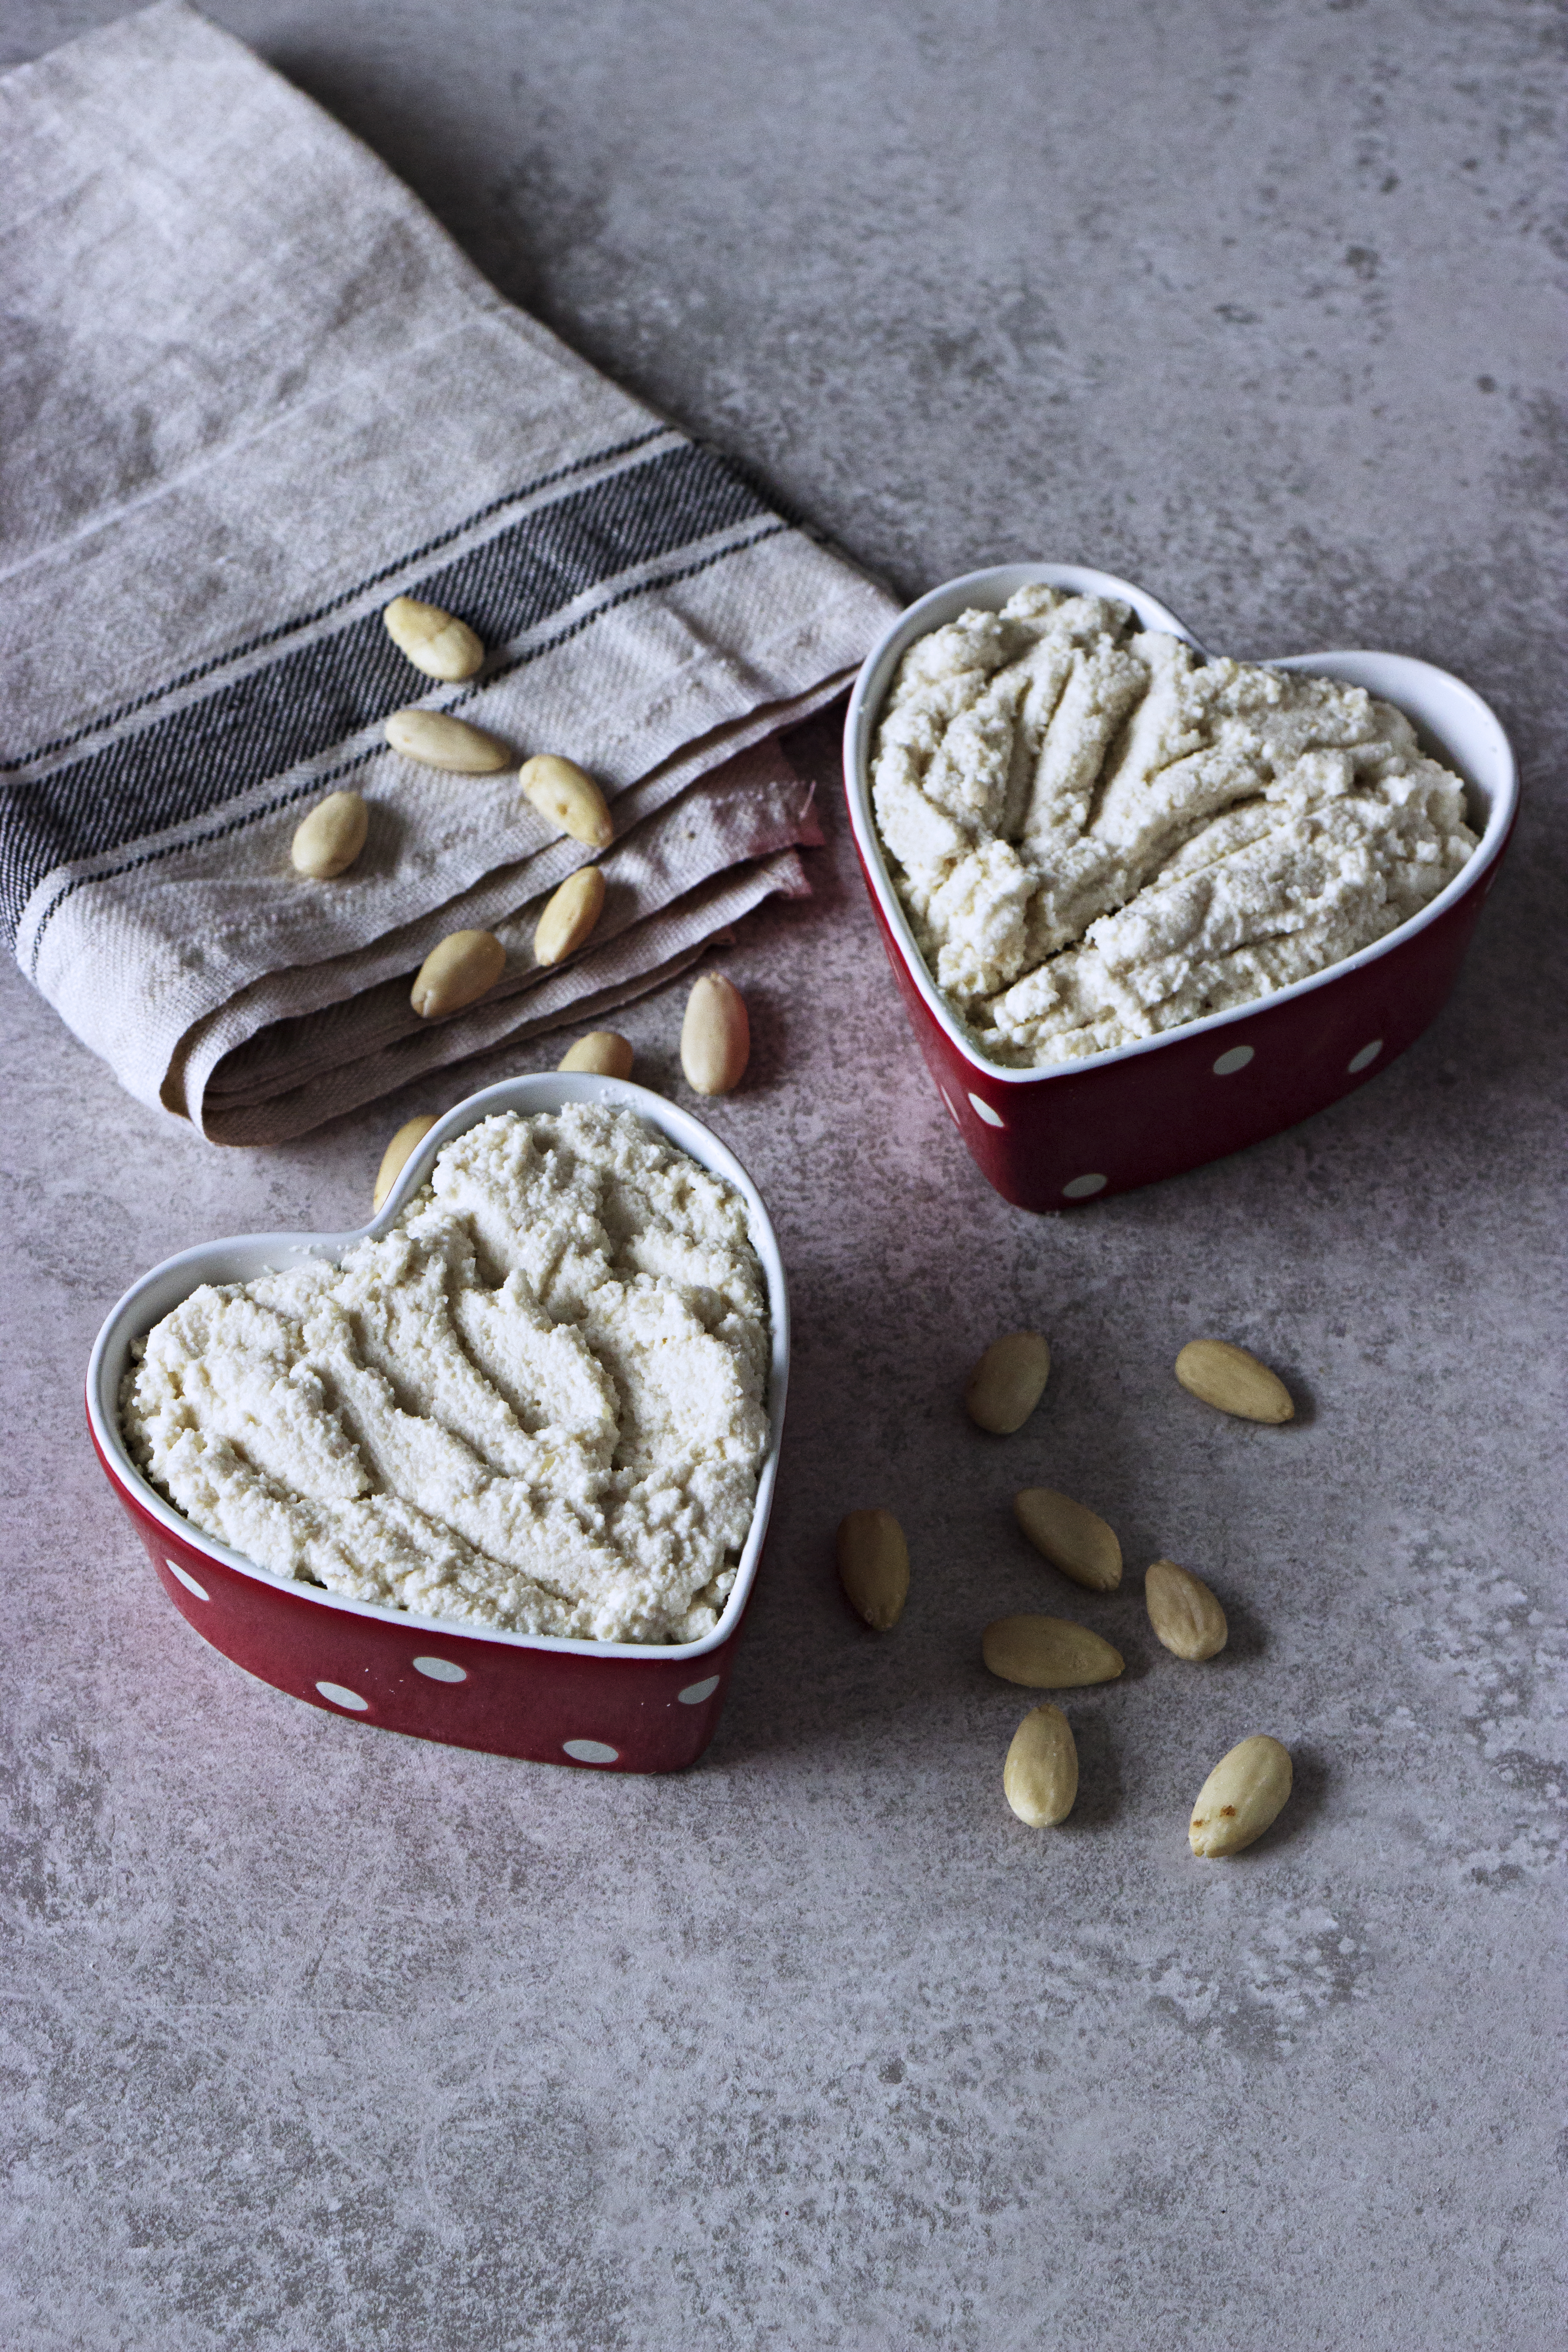 Almond Cream Cheese and Squash Jam / Queijo Creme de Amêndoa e Doce de Abóbora Chila